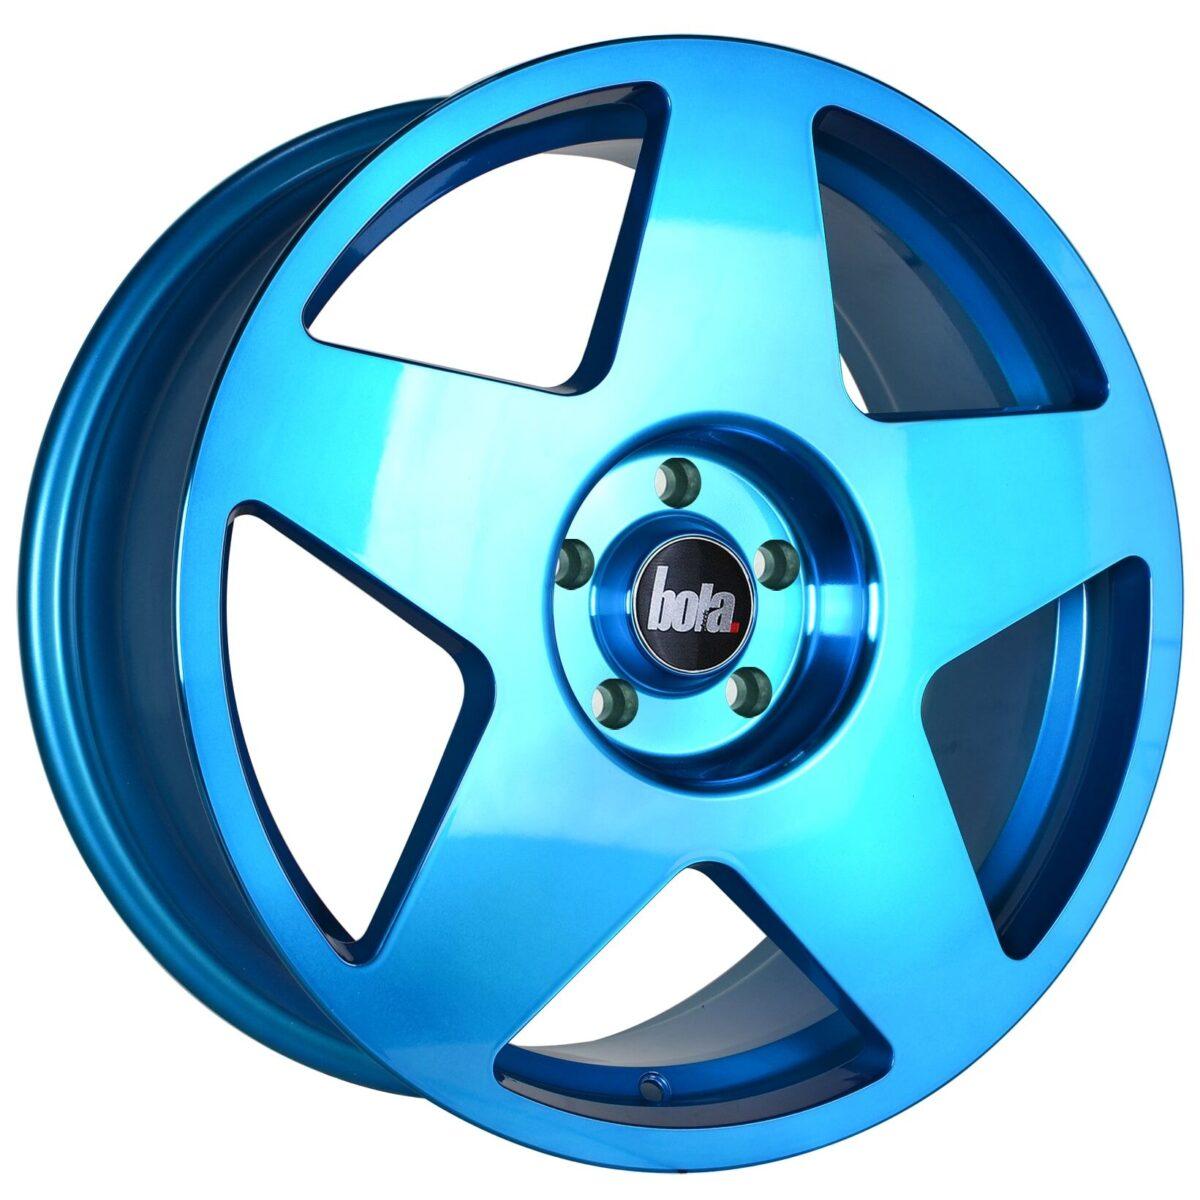 "19"" BOLA B10 Wheels - Hyper Blue - VW / Audi / Mercedes - 5x112"